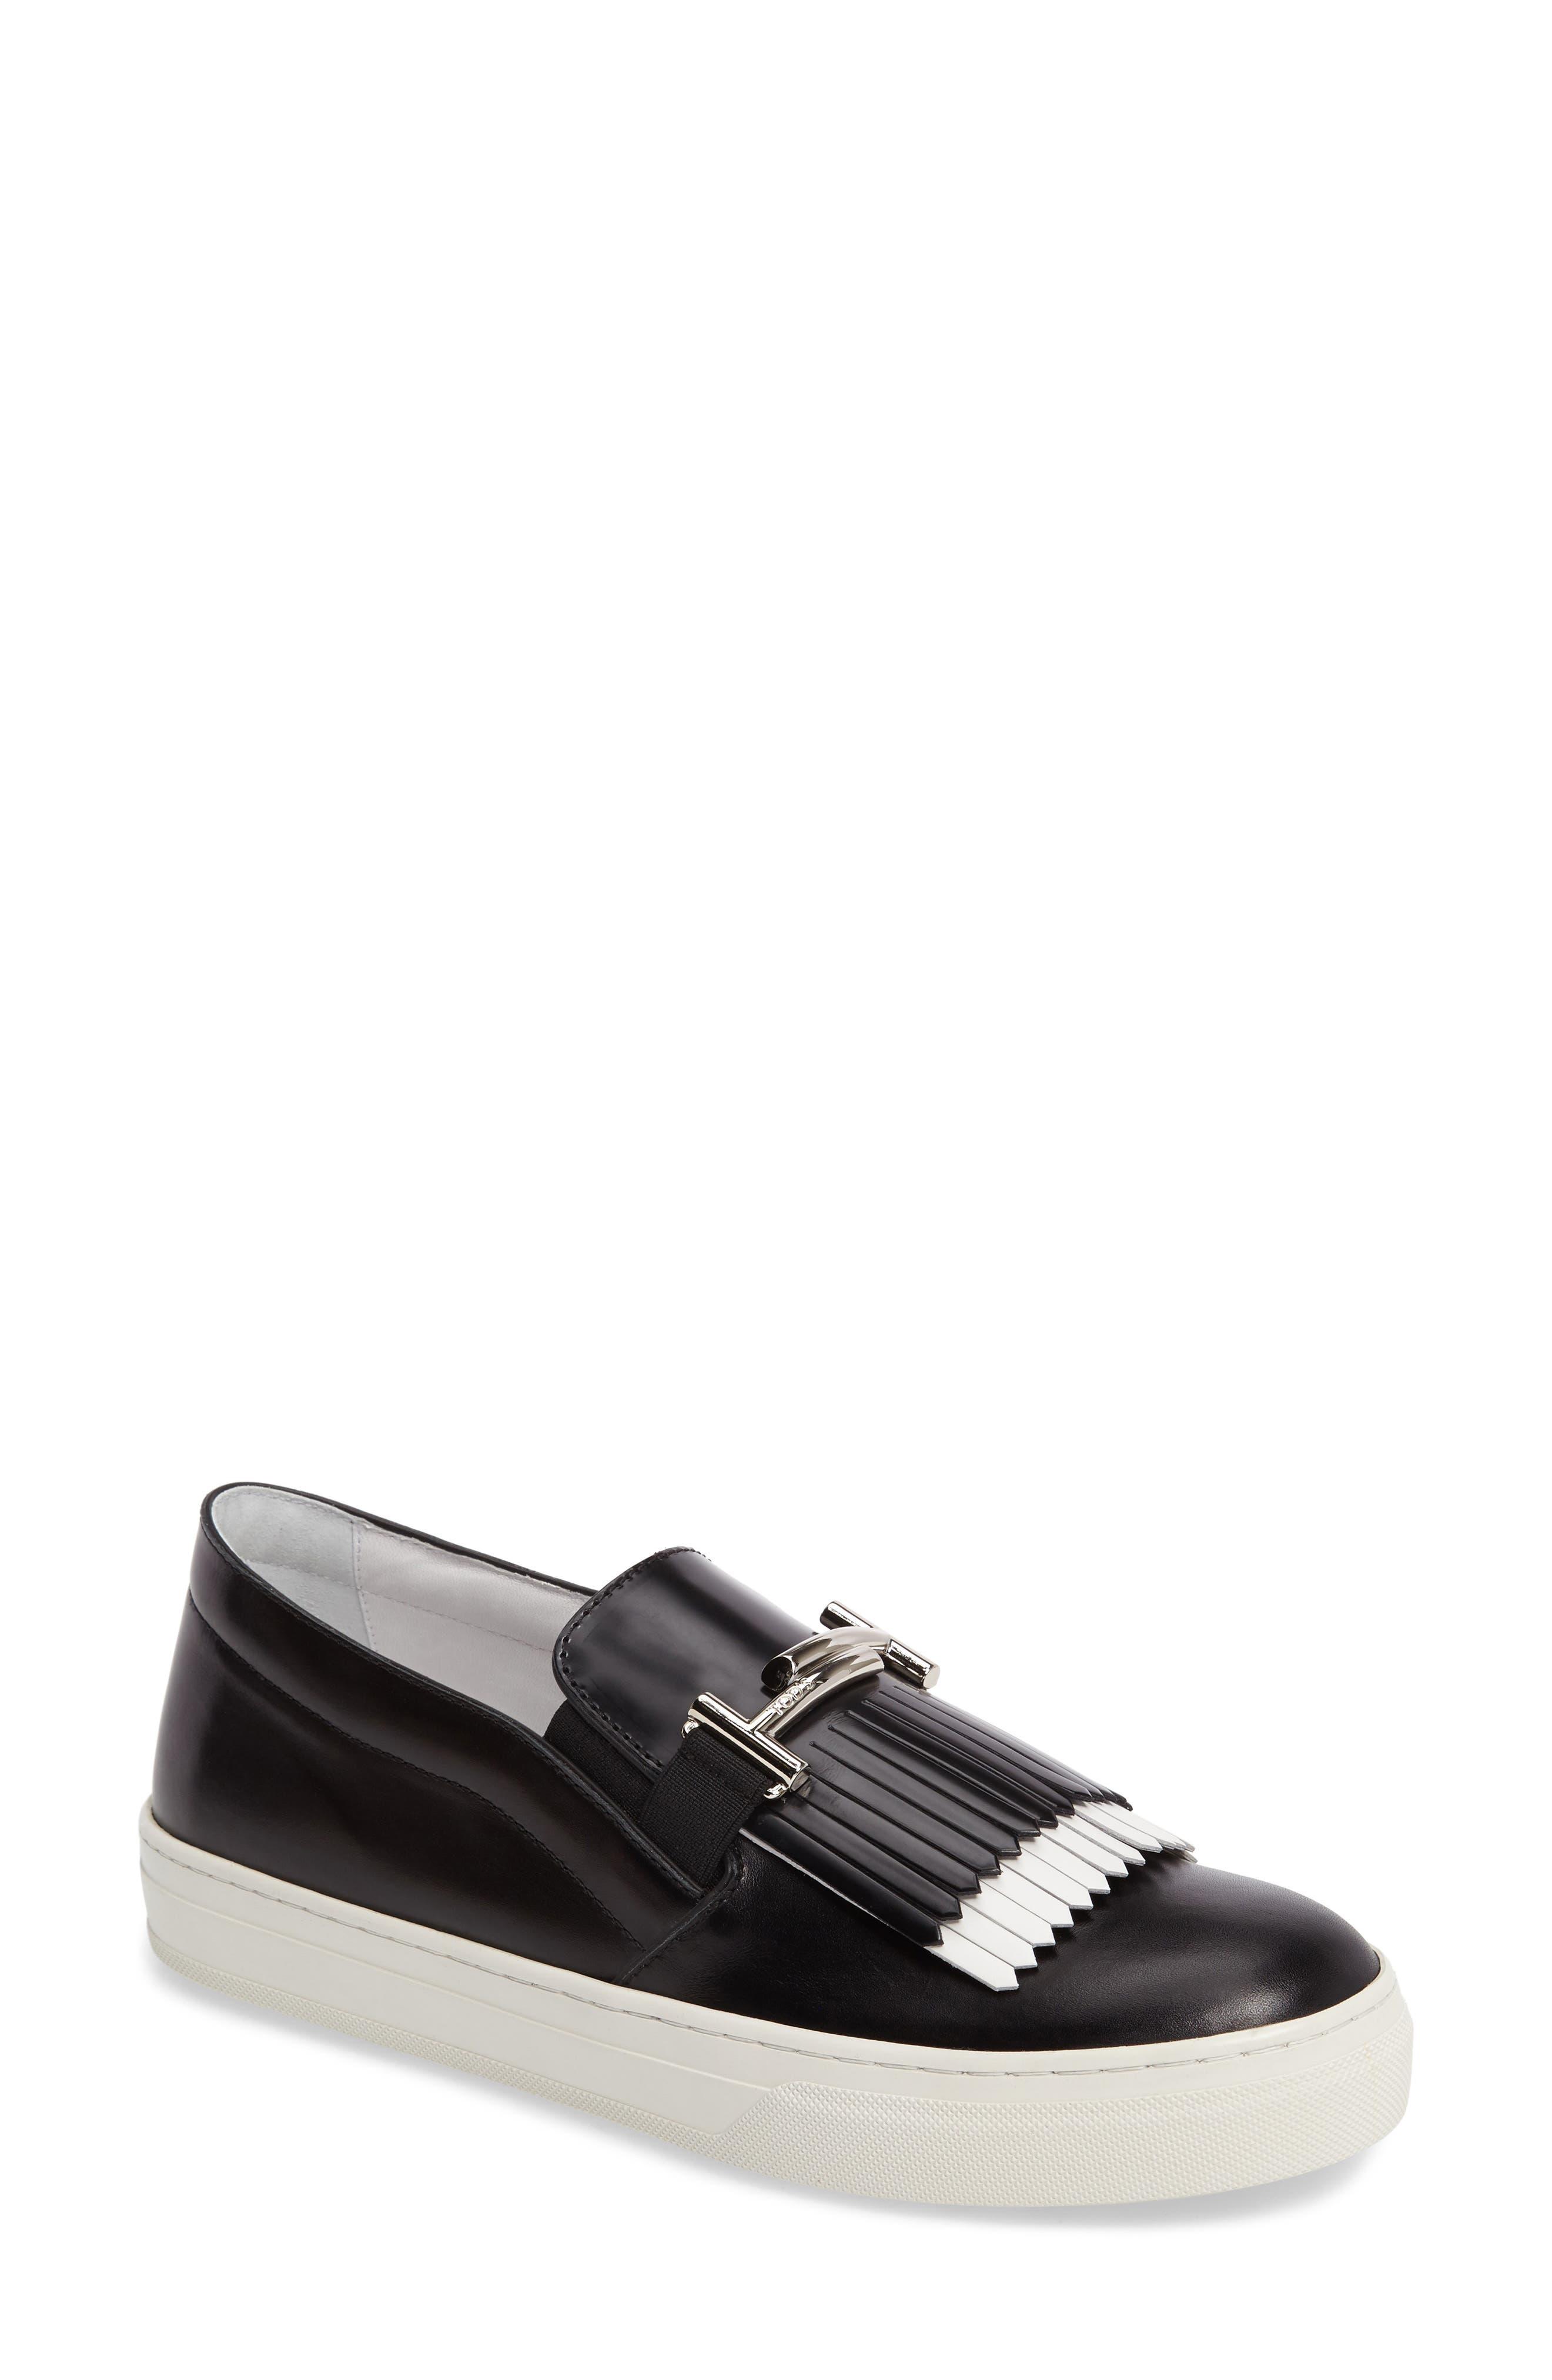 Double-T Kiltie Fringe Slip-On Sneaker,                         Main,                         color, 001